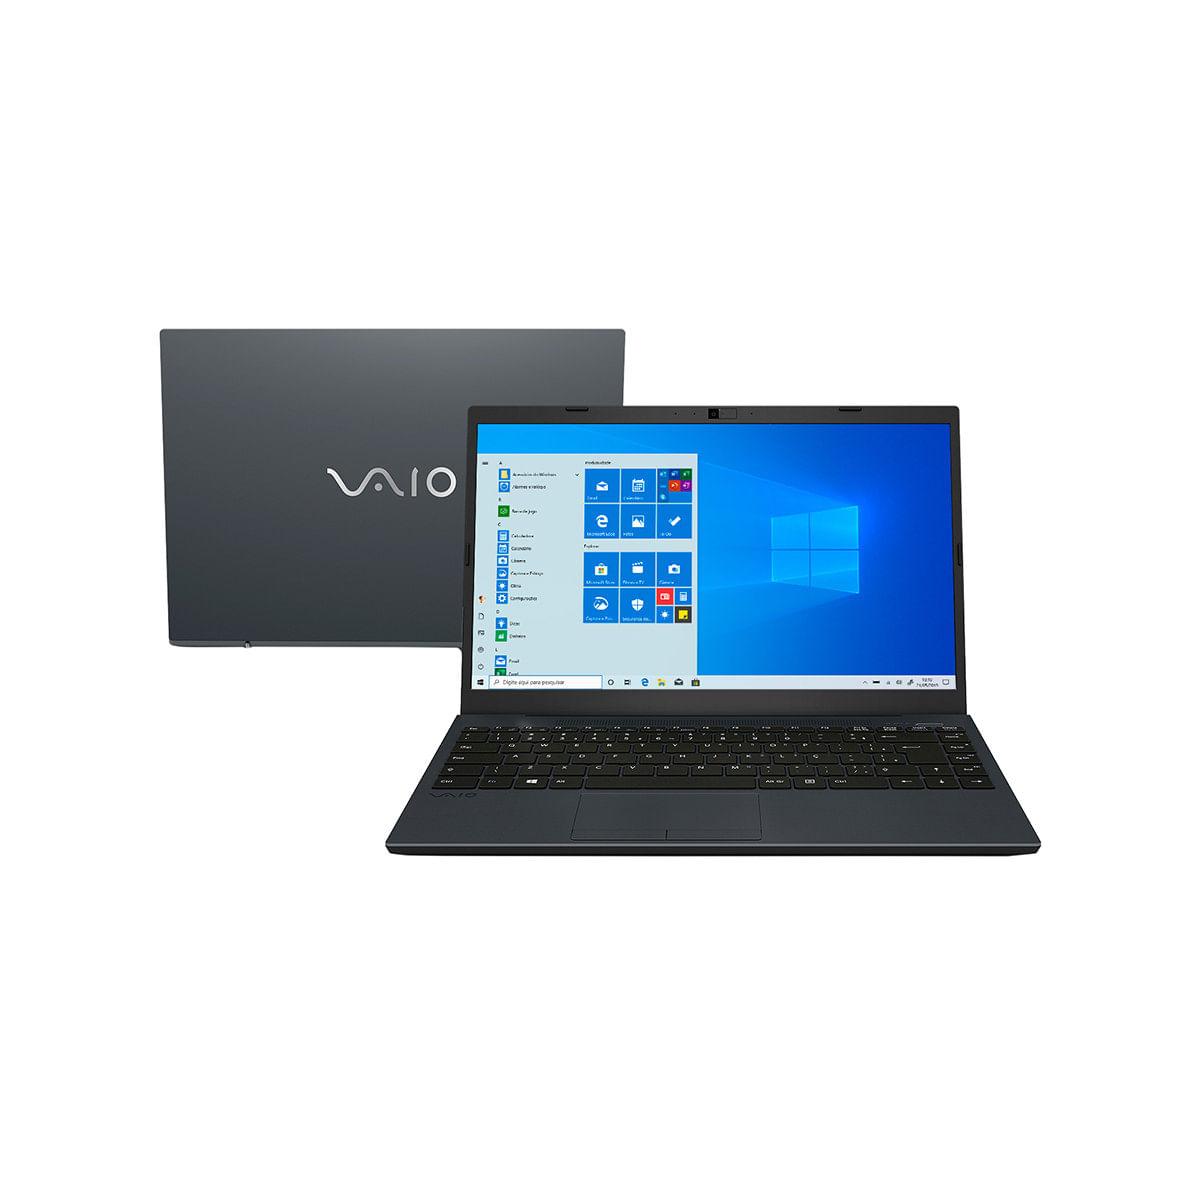 Notebook - Vaio Vjfe42b0541h I7-10510u 1.80ghz 16gb 256gb Ssd Intel Hd Graphics Windows 10 Home Fe14 14